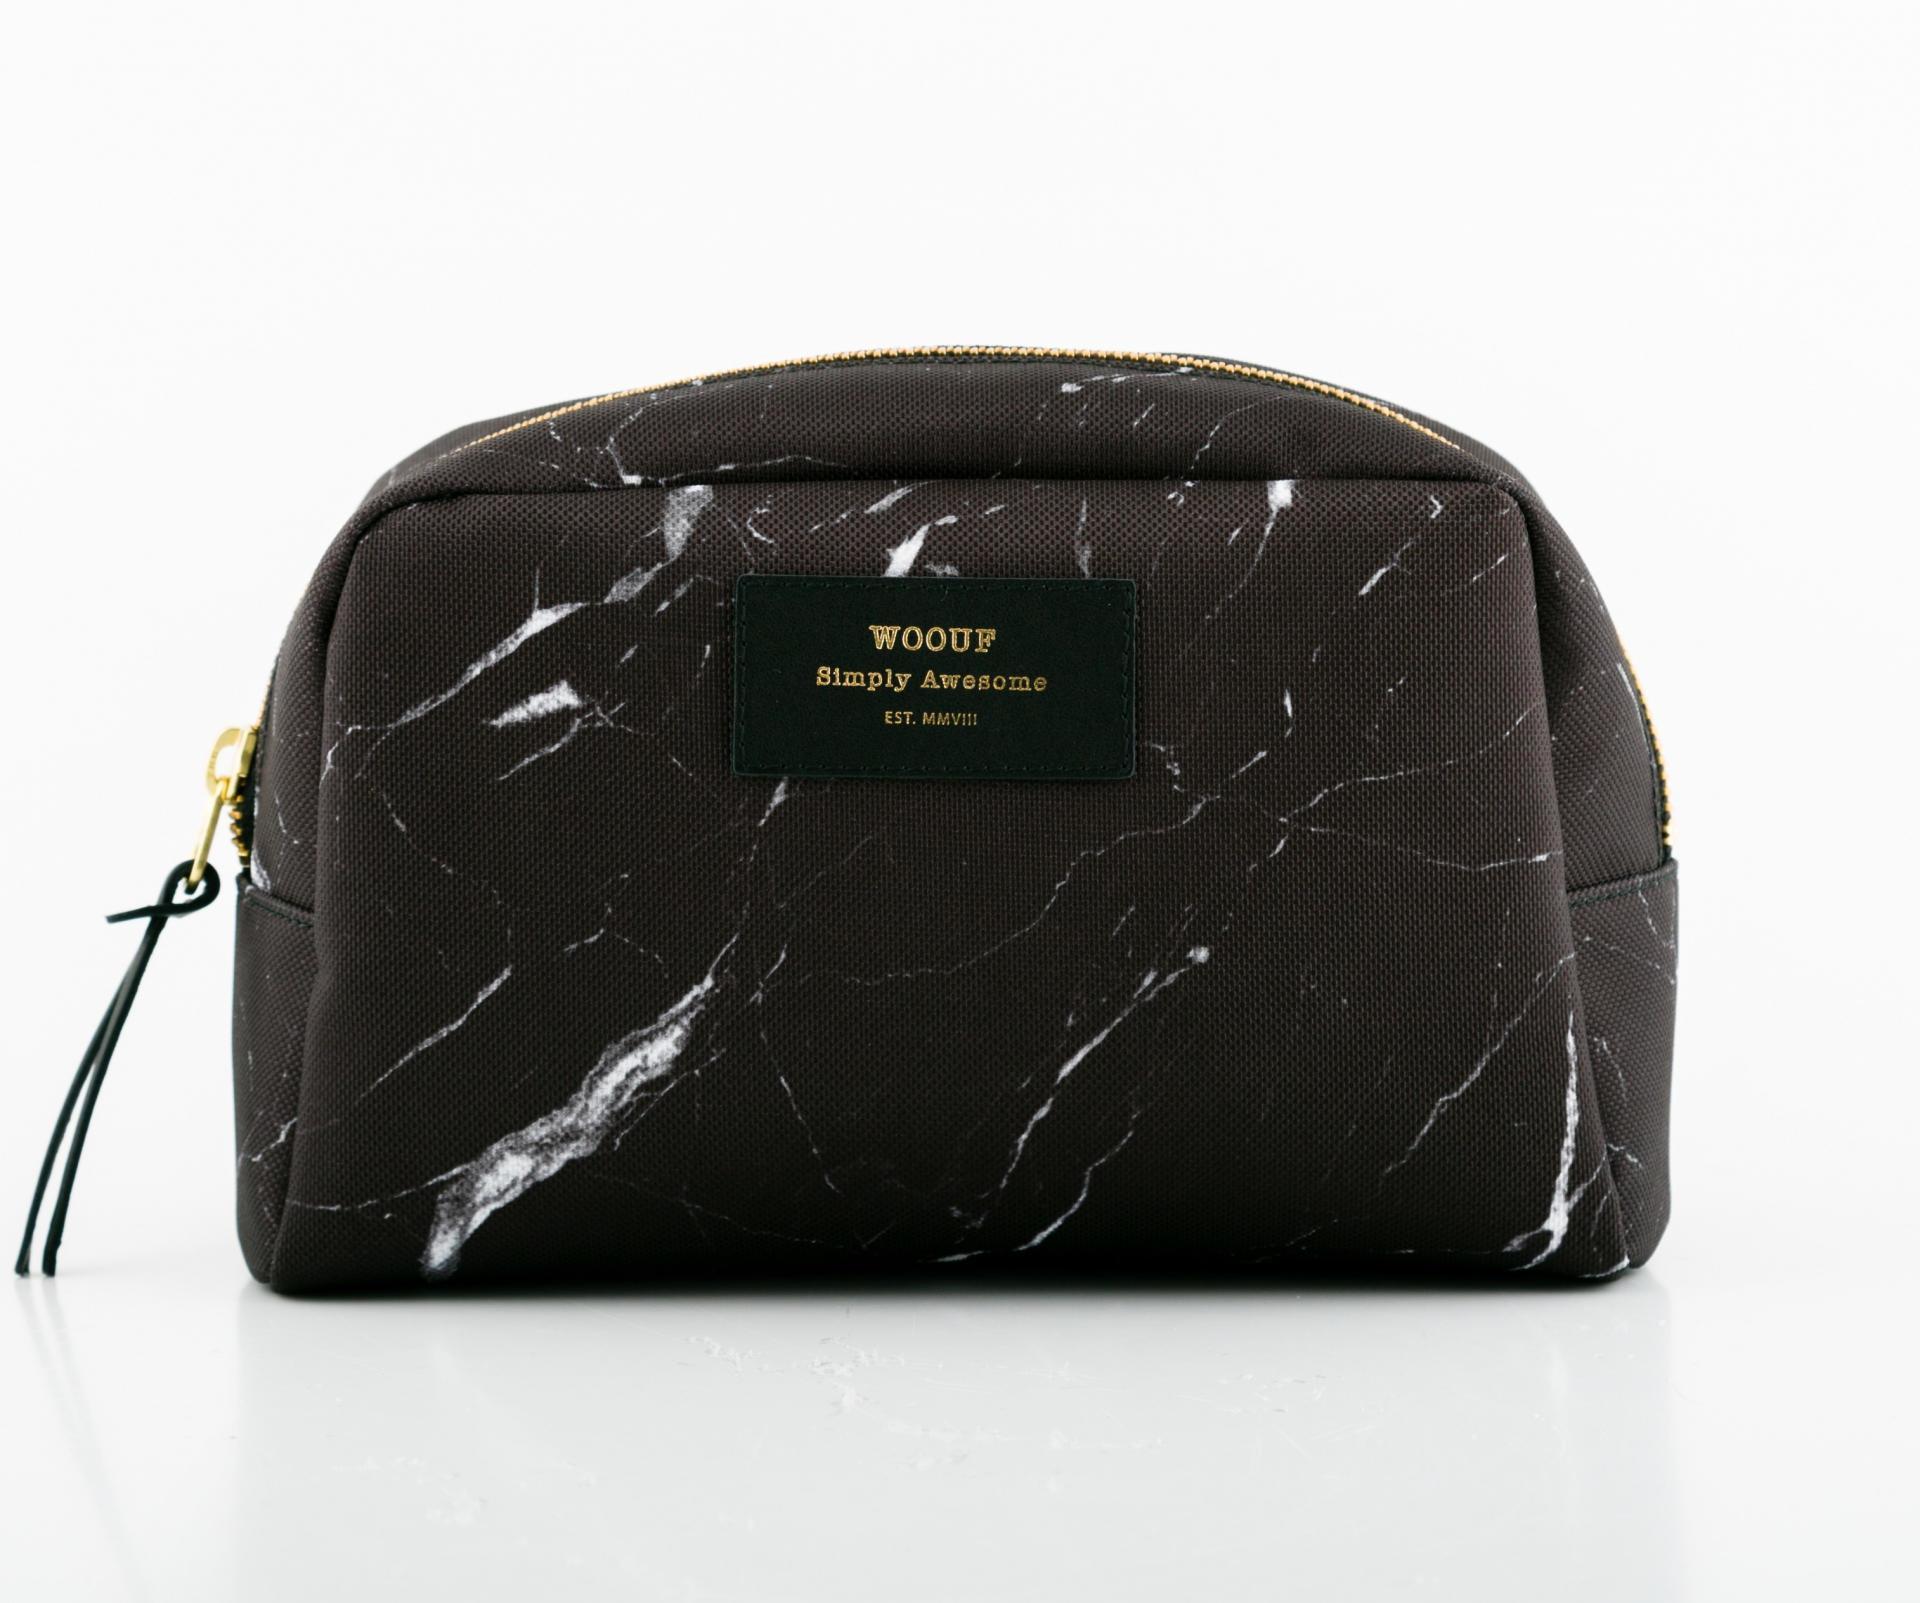 Woouf! Kosmetická taška Black Marble, černá barva, textil